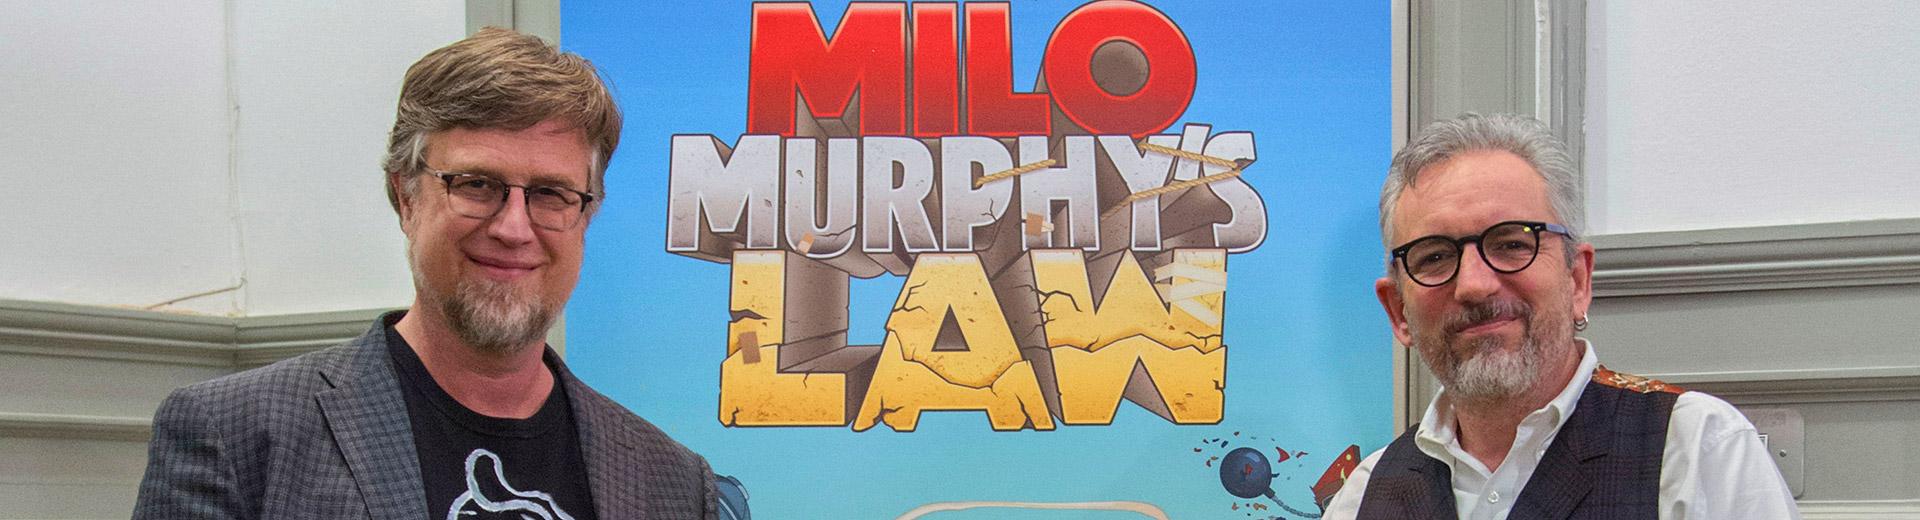 MiloMurphysLaw-interview-banner-1920x520.jpg